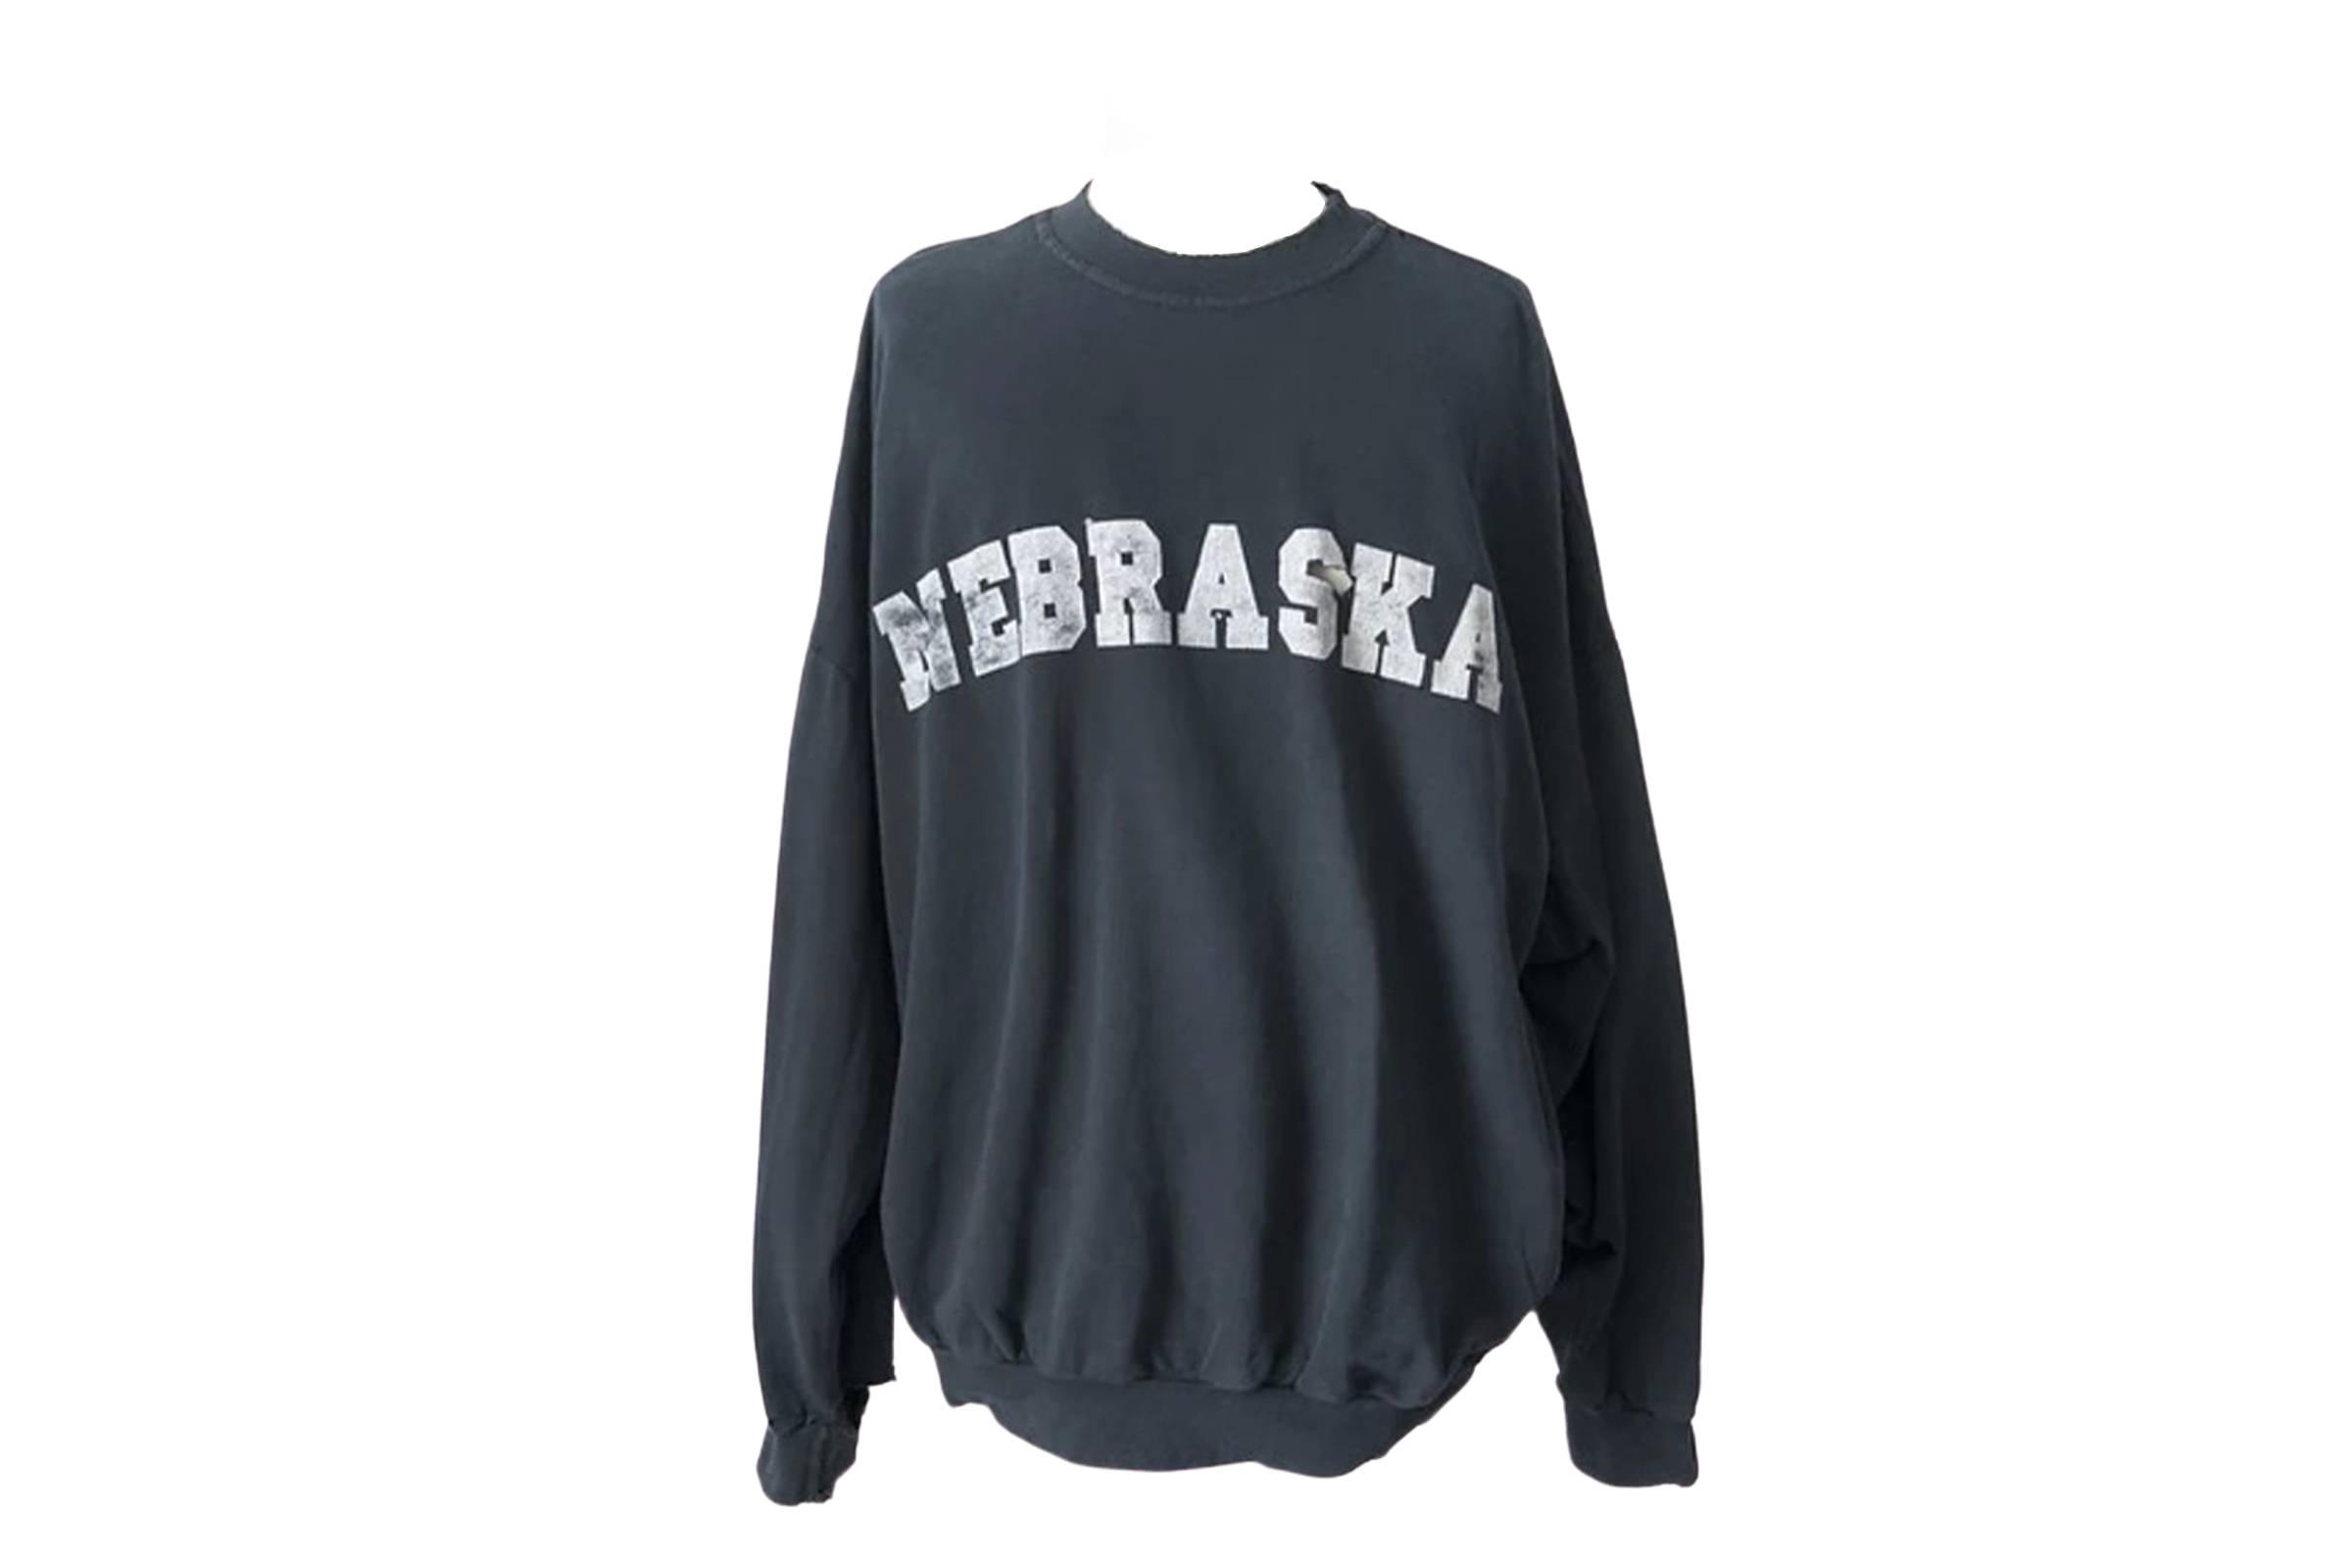 Raf Simons Fall/Winter 2002 Nebraska Sweatshirt